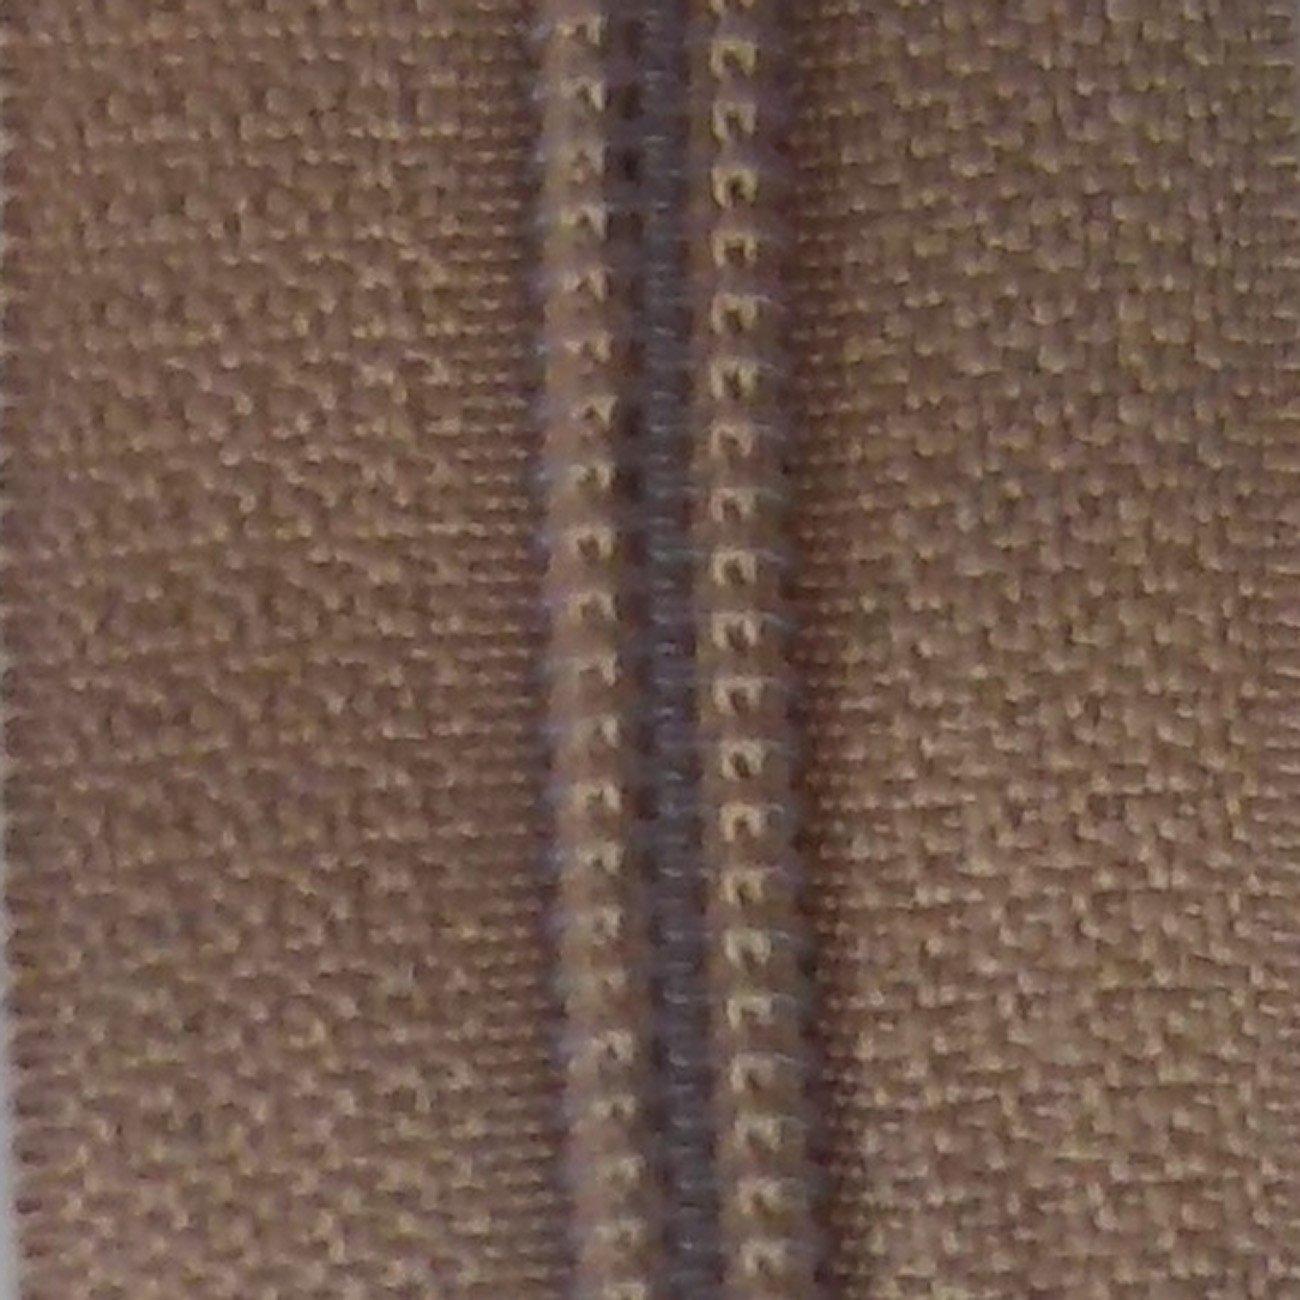 22 Non-separating Zipper Natural